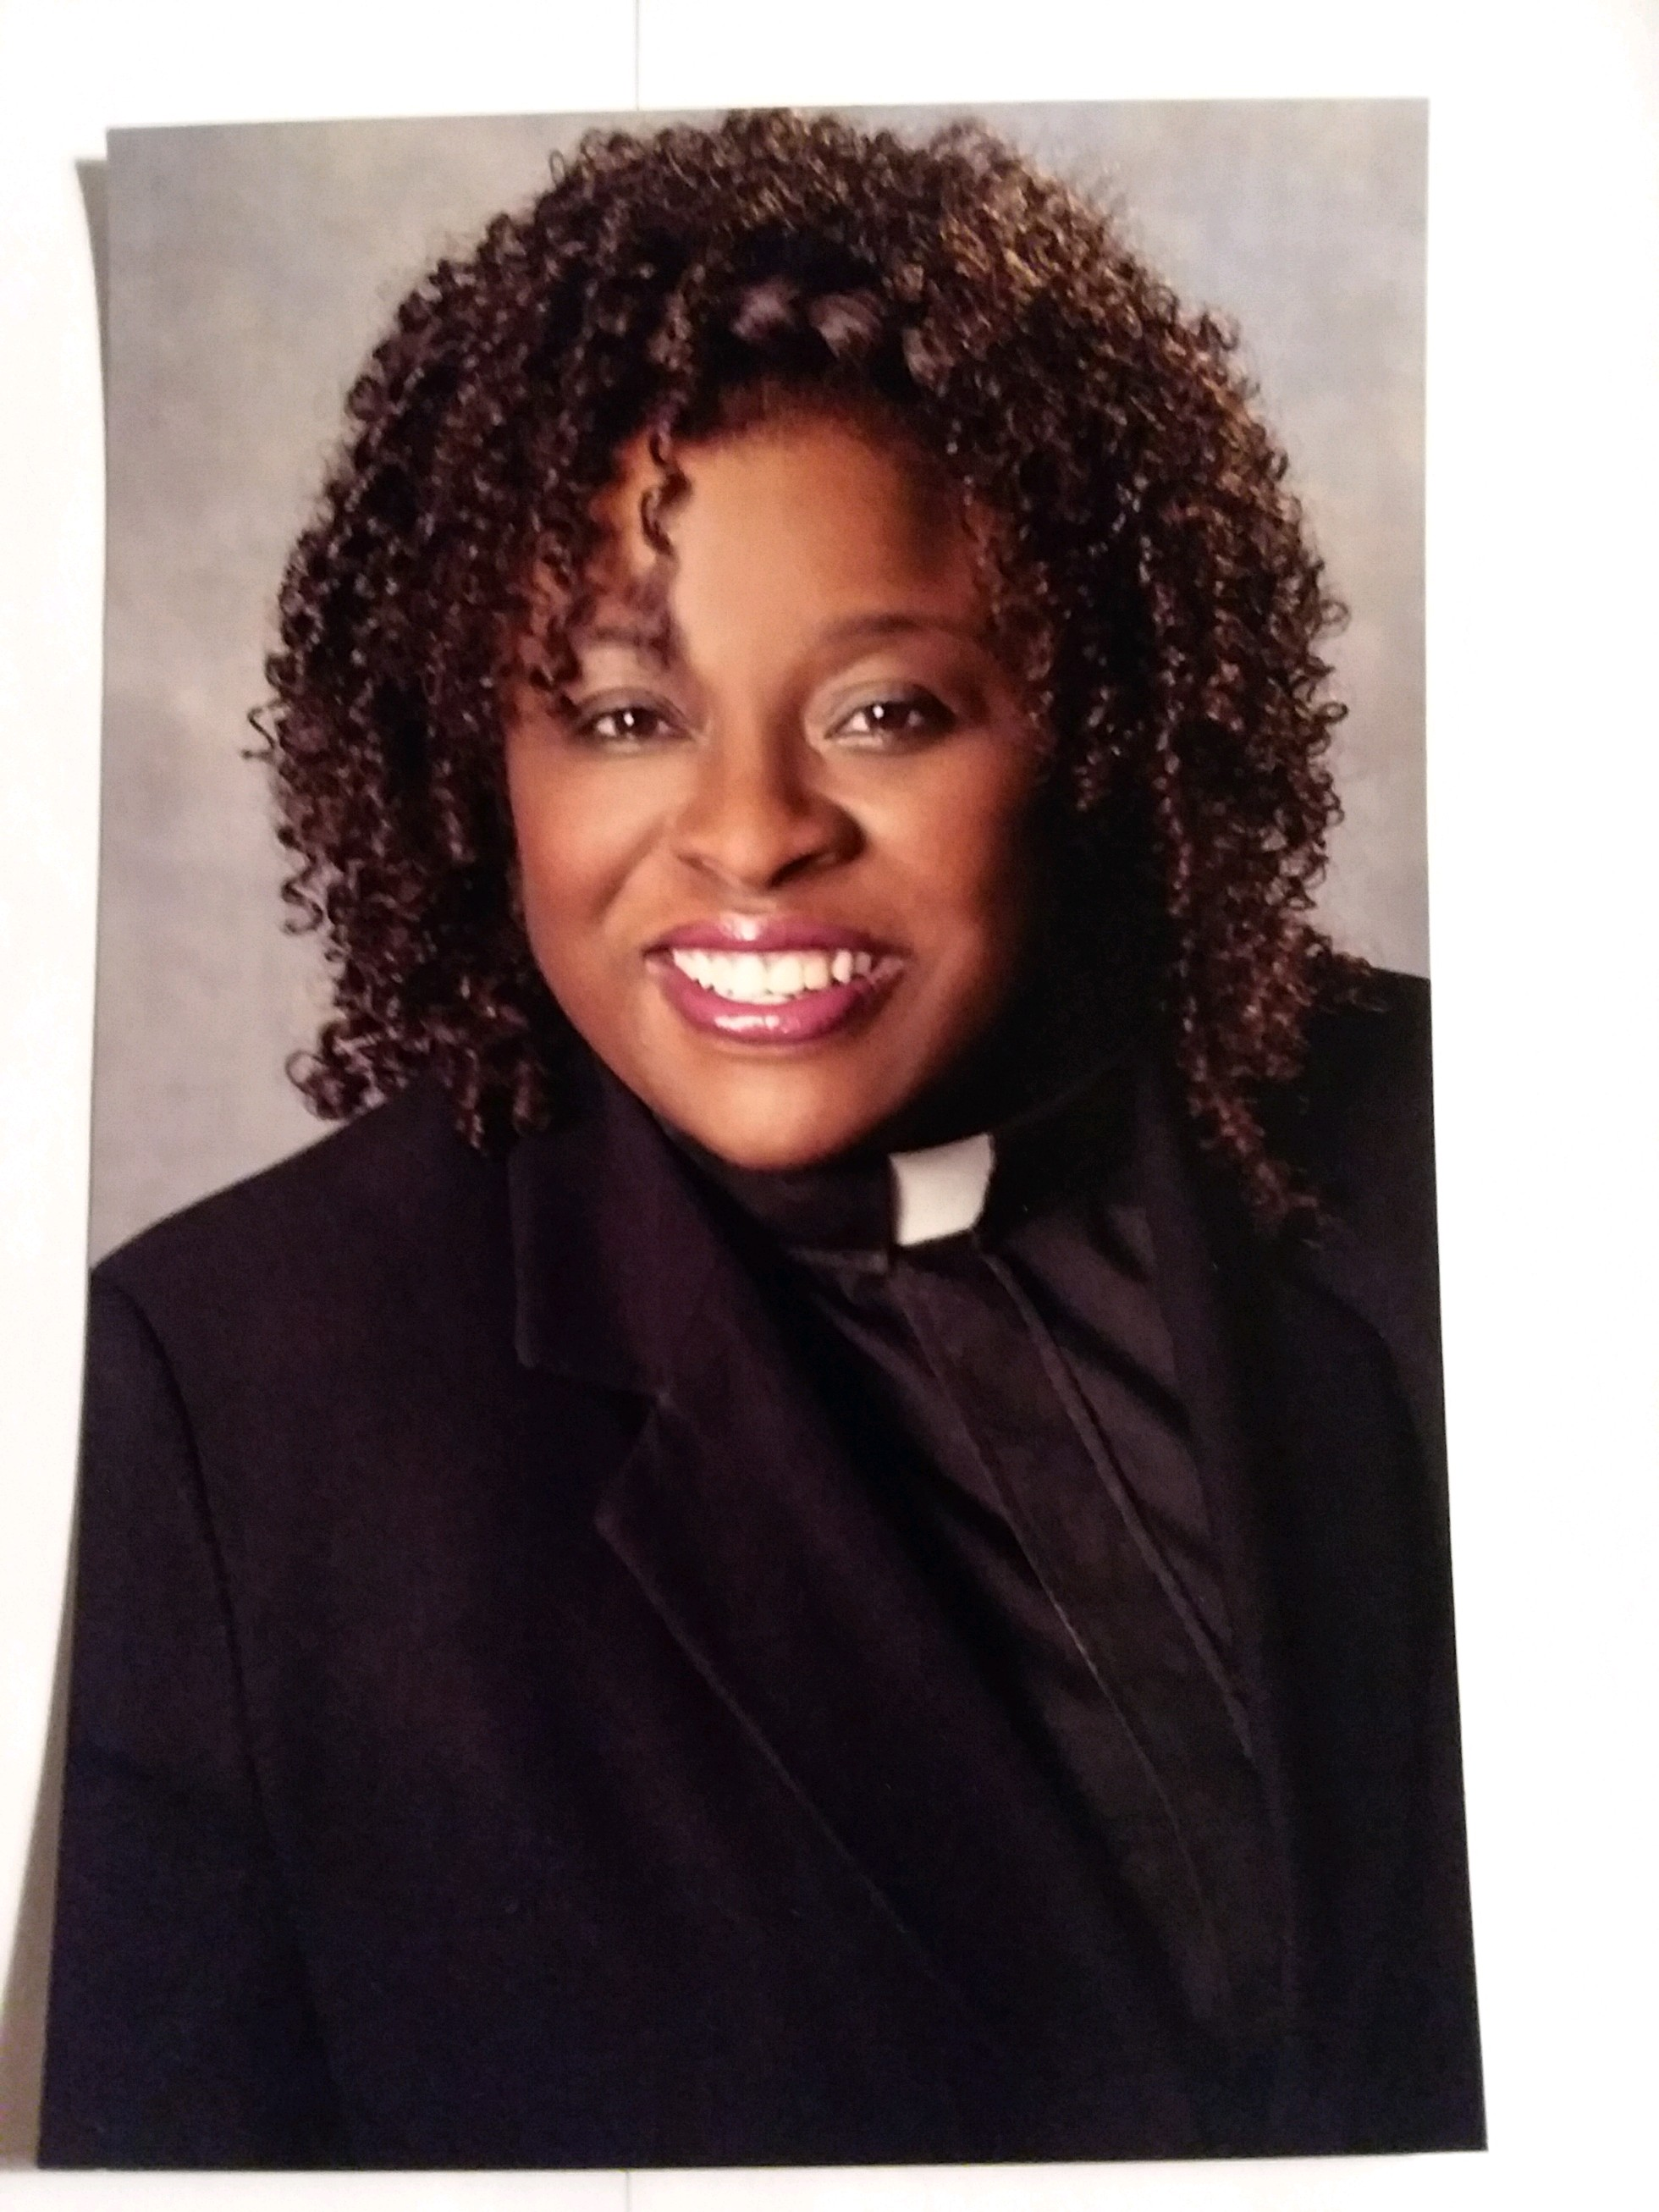 Cheryl Prince Moore